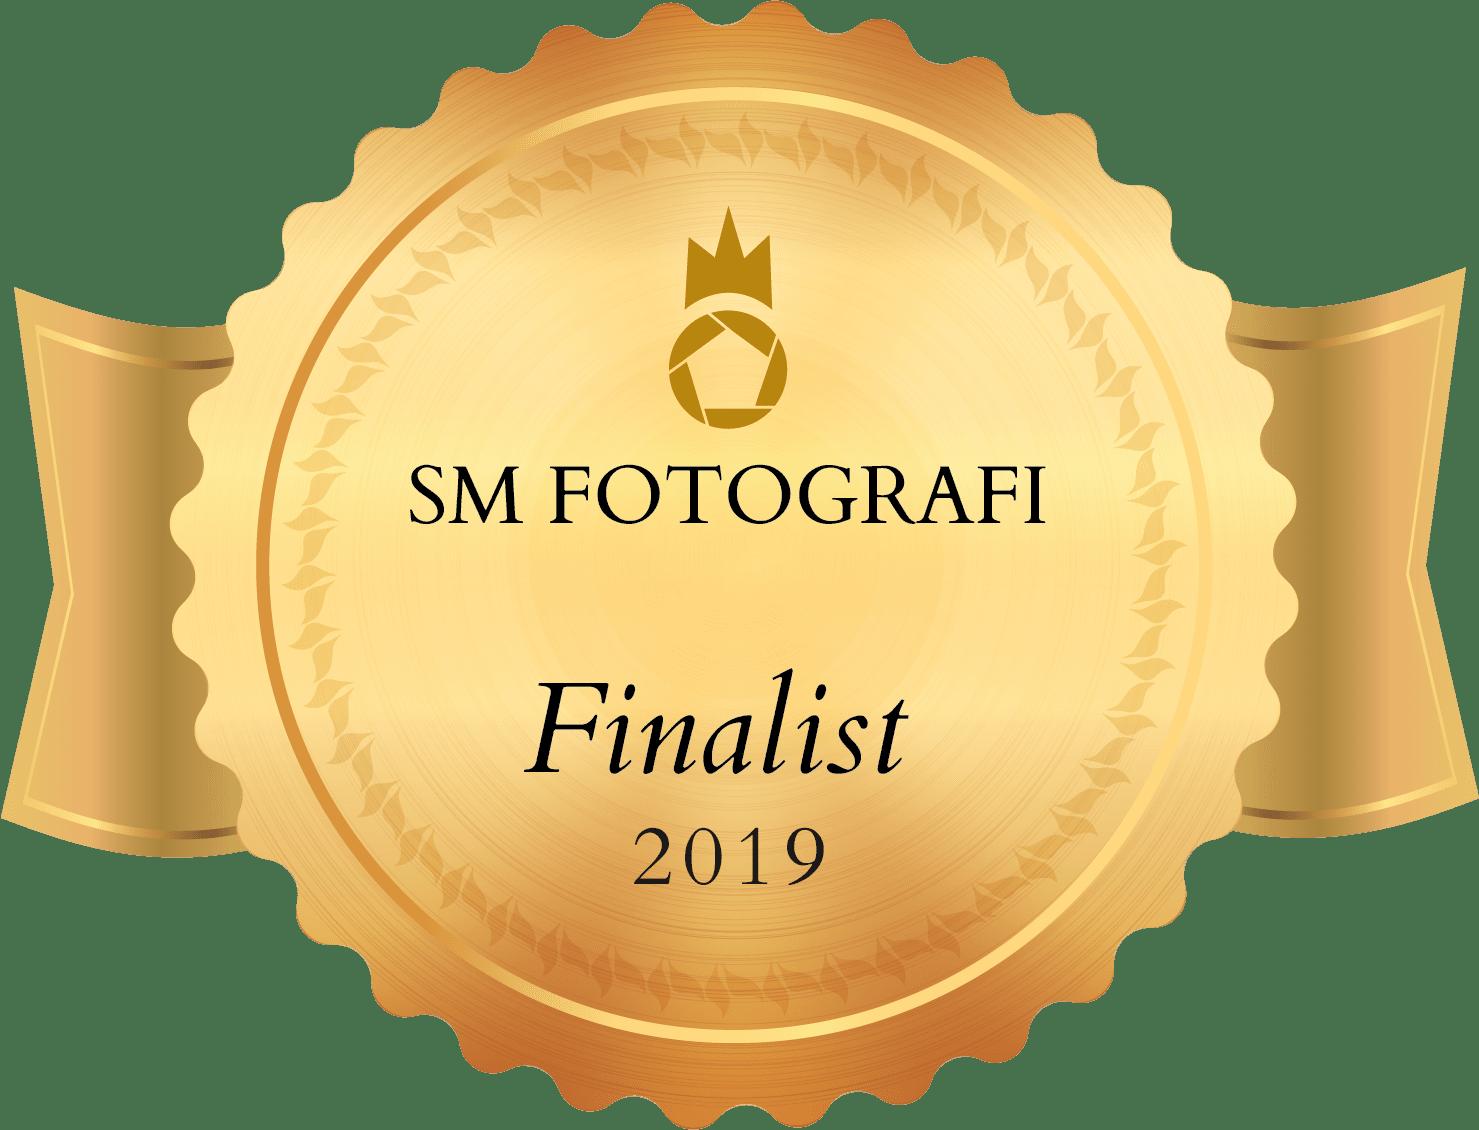 Emblem prisbelönt-finalist-2019